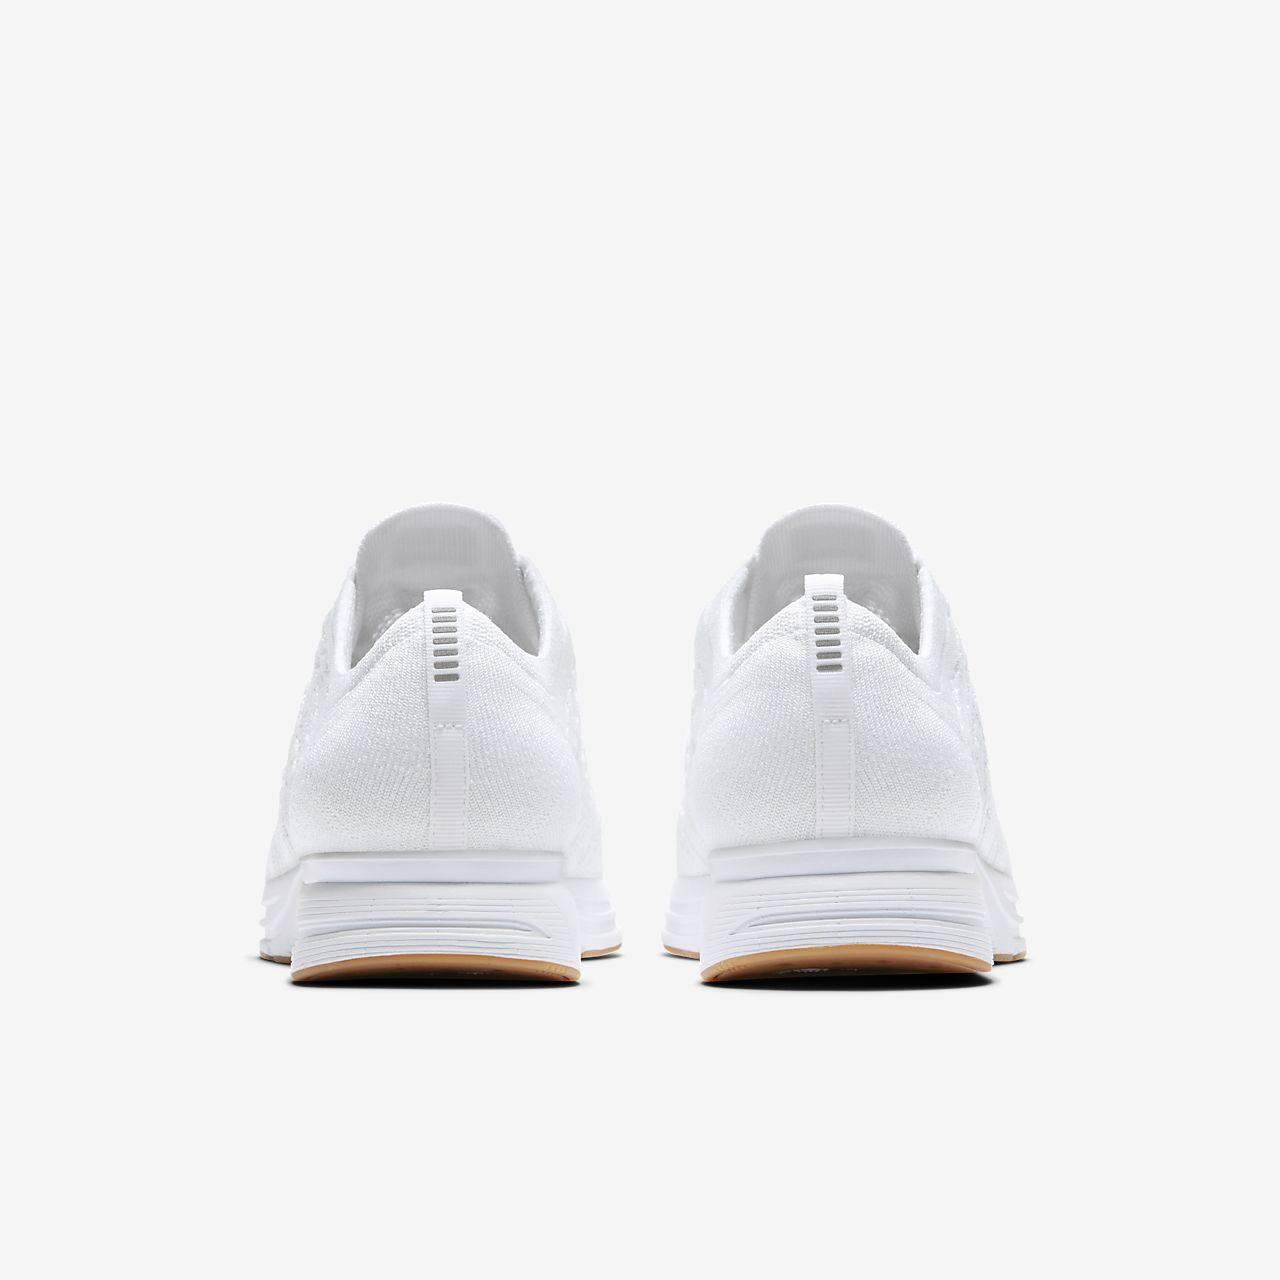 promo code 98579 36b51 ... Nike Flyknit Trainer Unisex Shoe